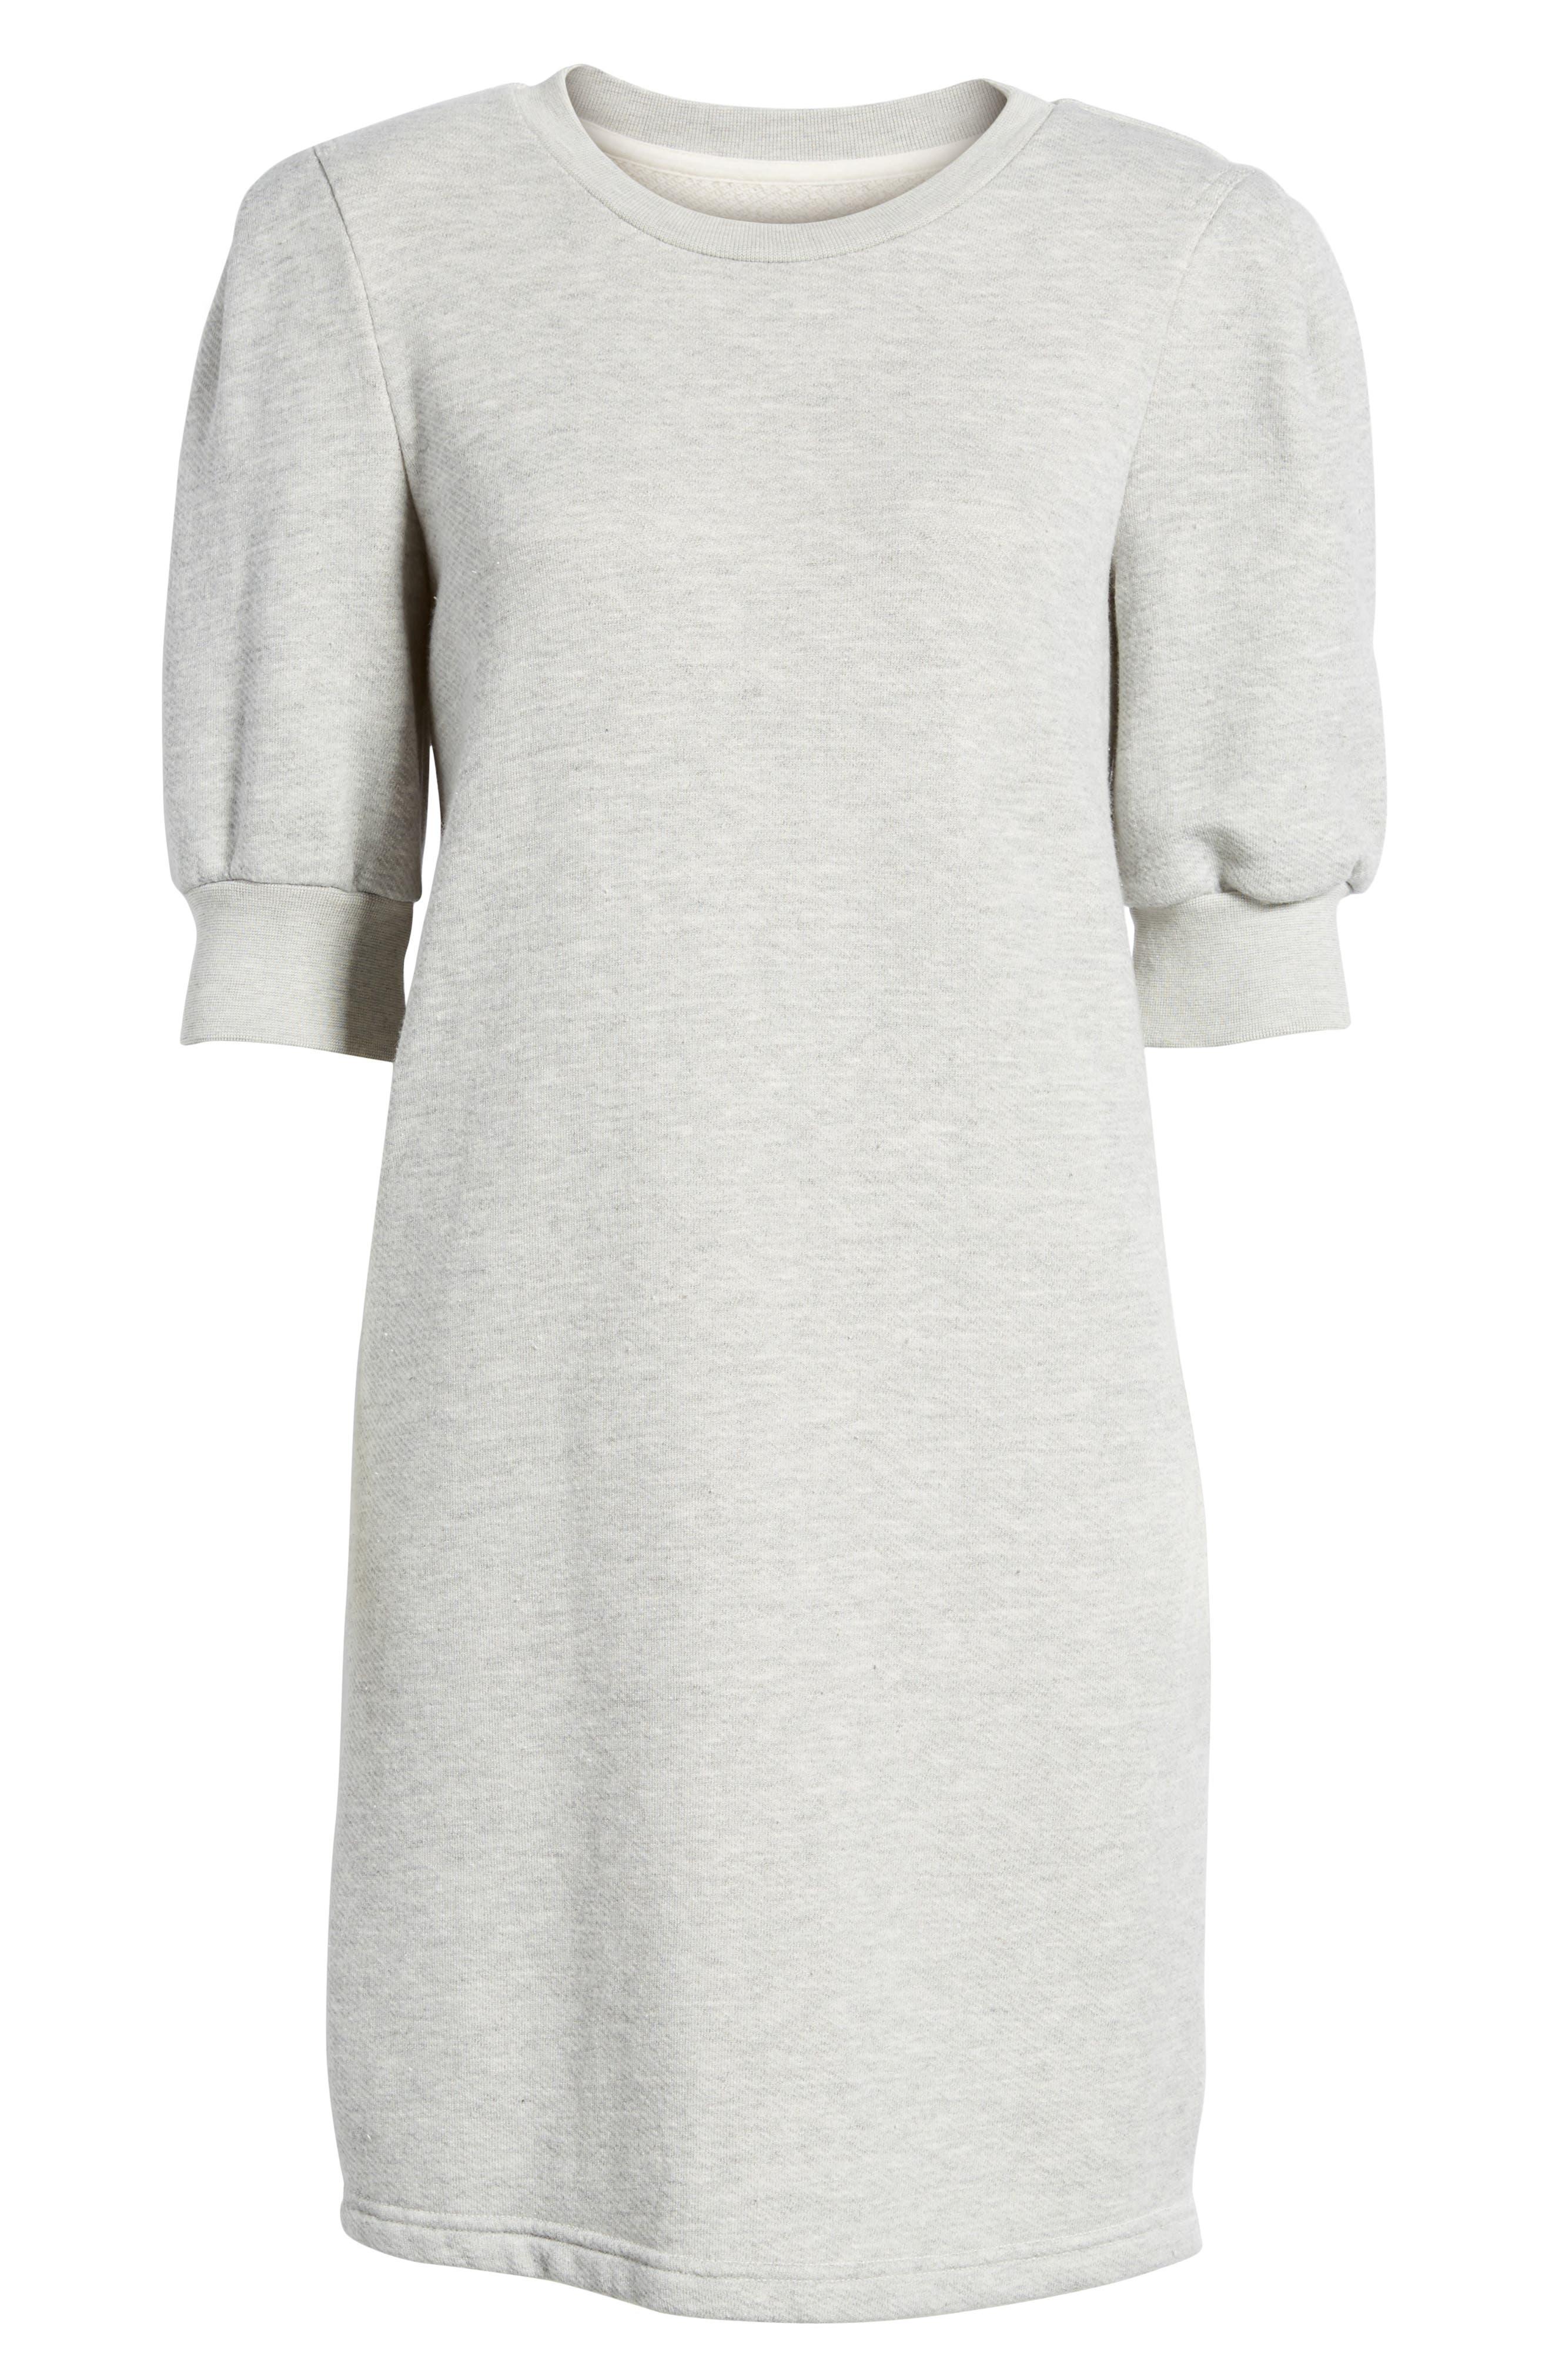 The Pleat Sweatshirt Dress,                             Alternate thumbnail 6, color,                             062